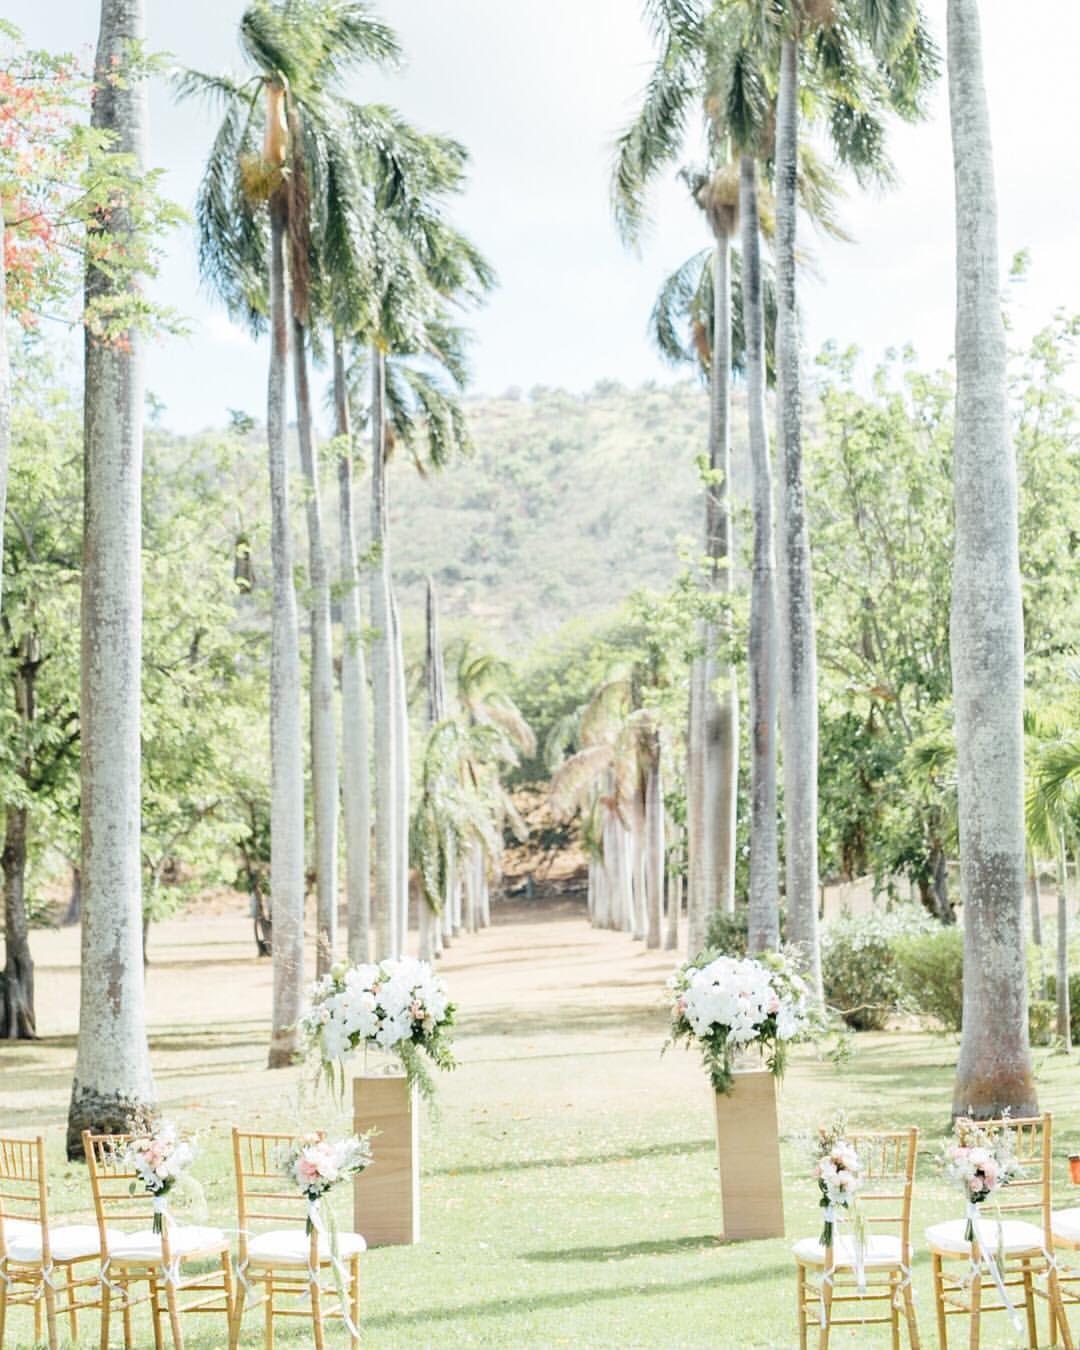 Waikiki Beach Wedding Ceremony: This Dreamy Modern Boho Ceremony Took Place Under An Aisle